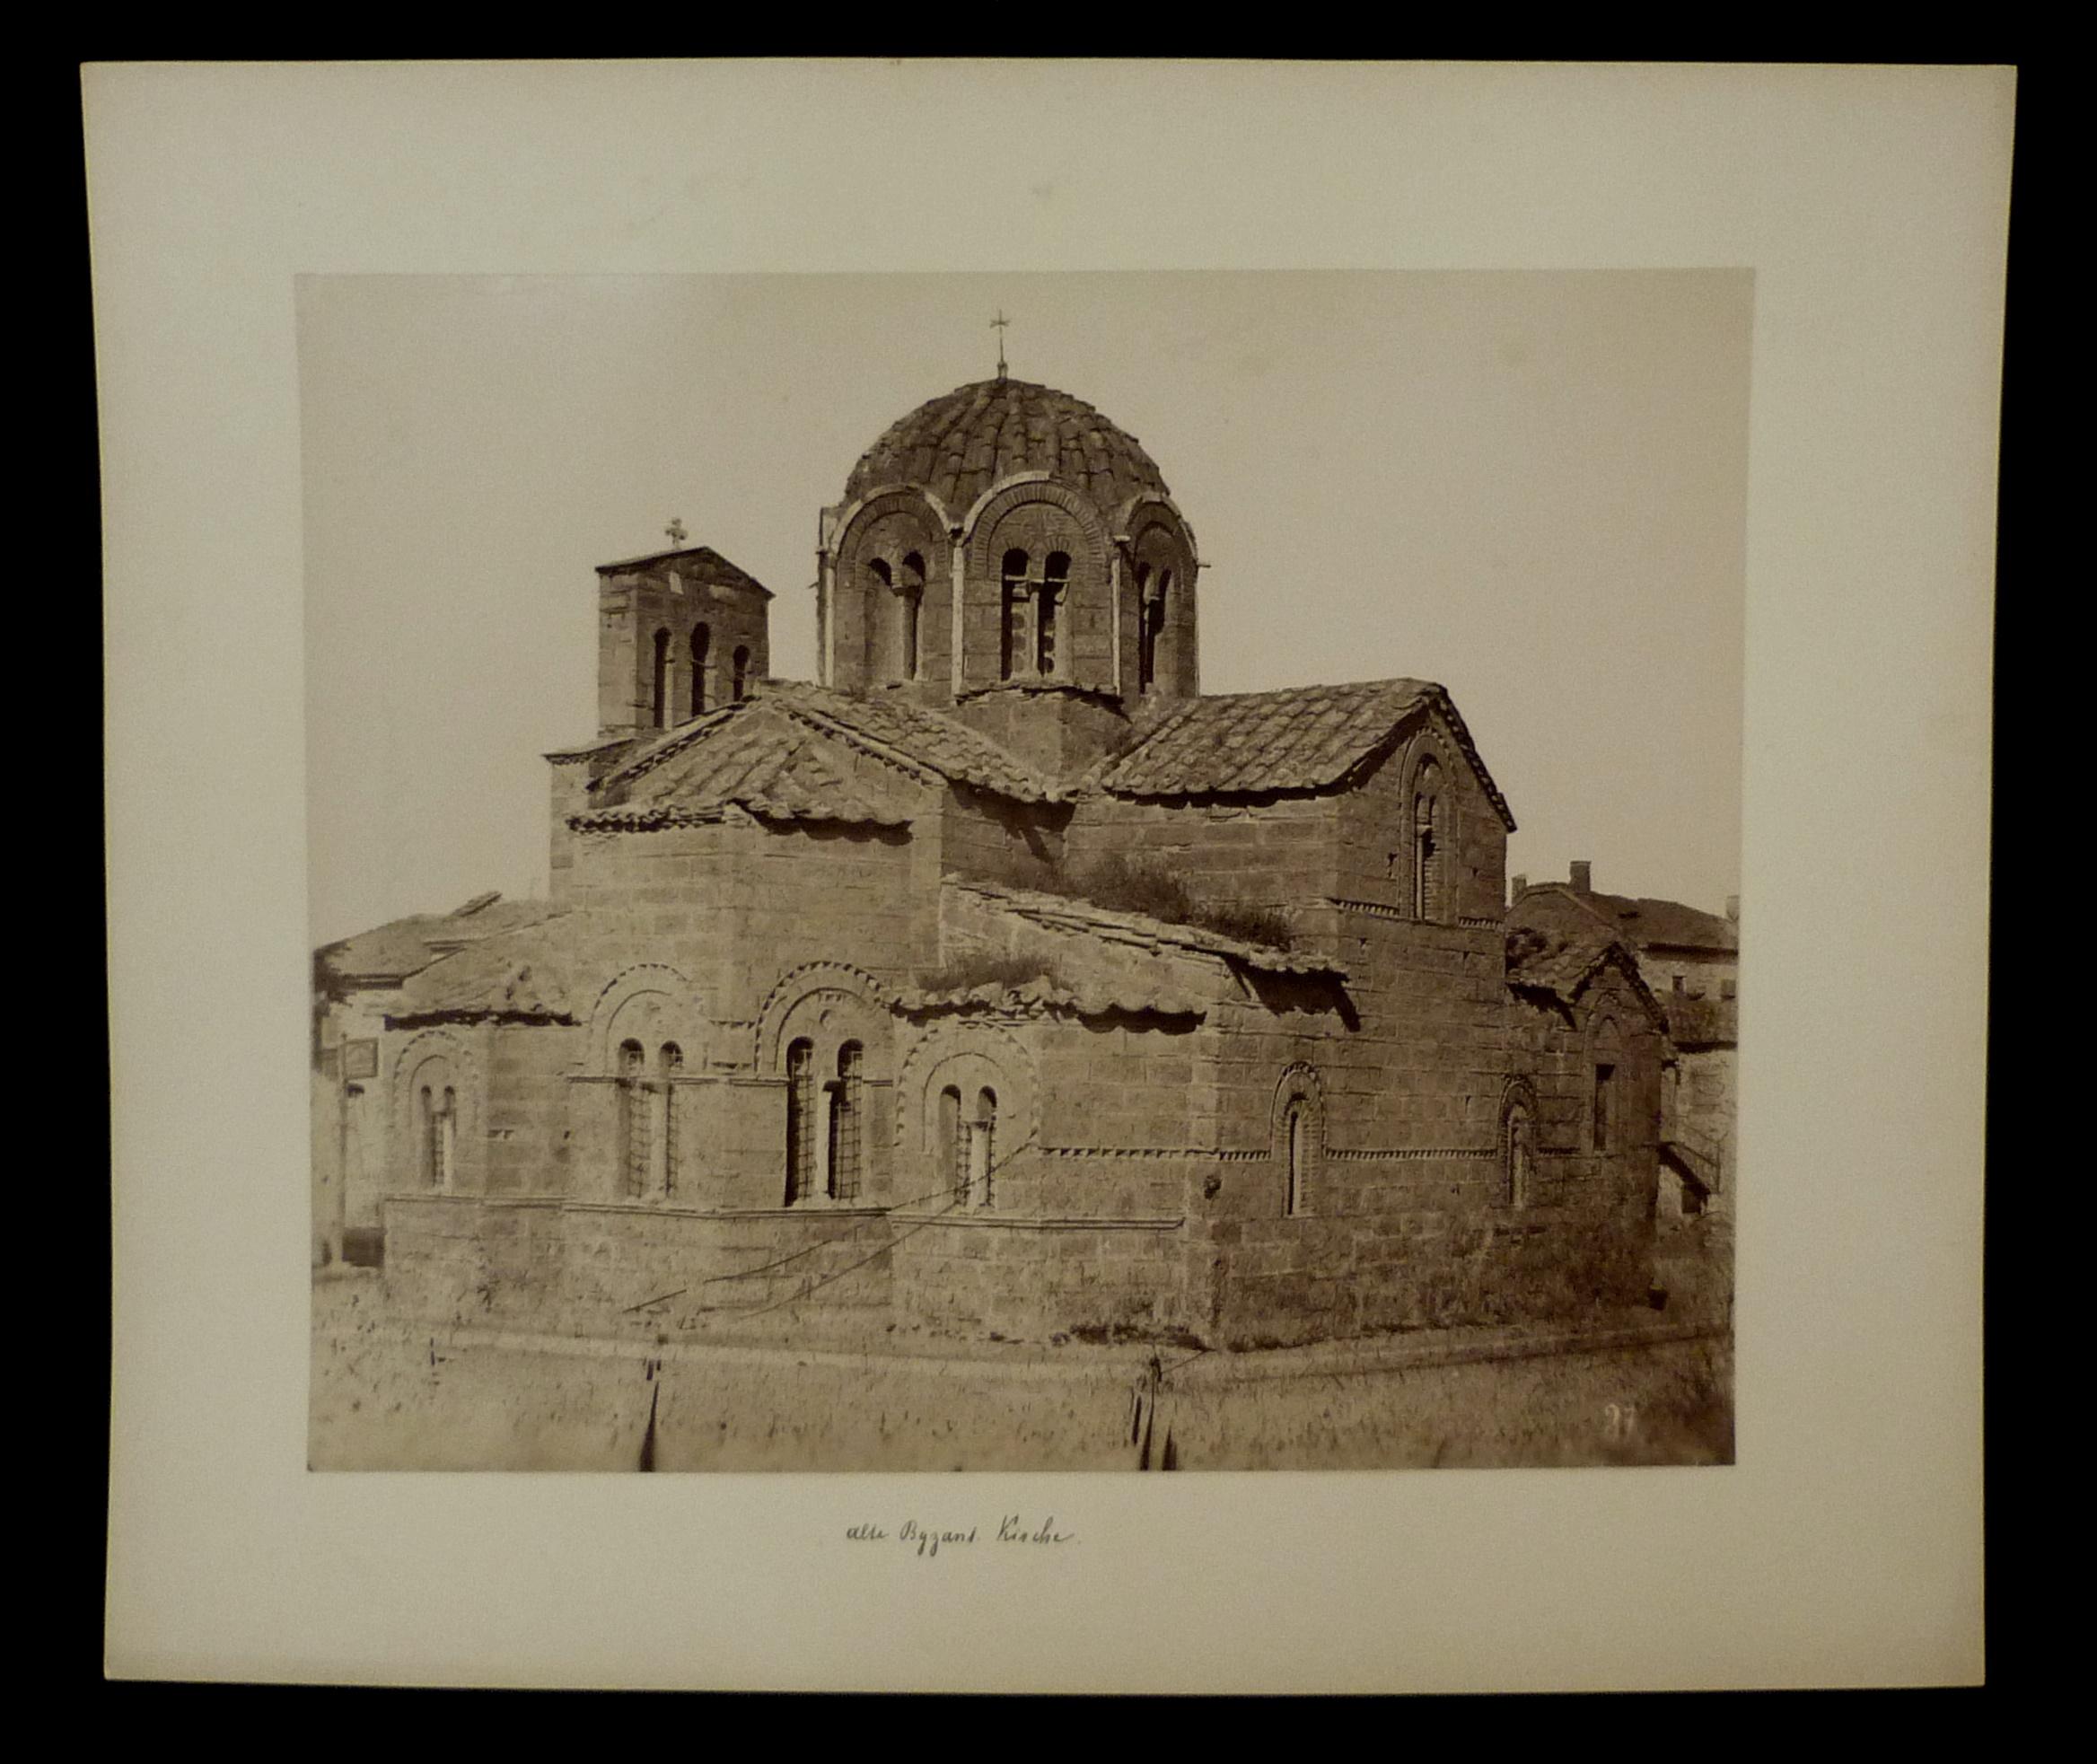 Hs. beschriftet: Alte Byzant. Kirche. Originalfotografie (21,3x25,7: Originalfotografien - Griechenland.